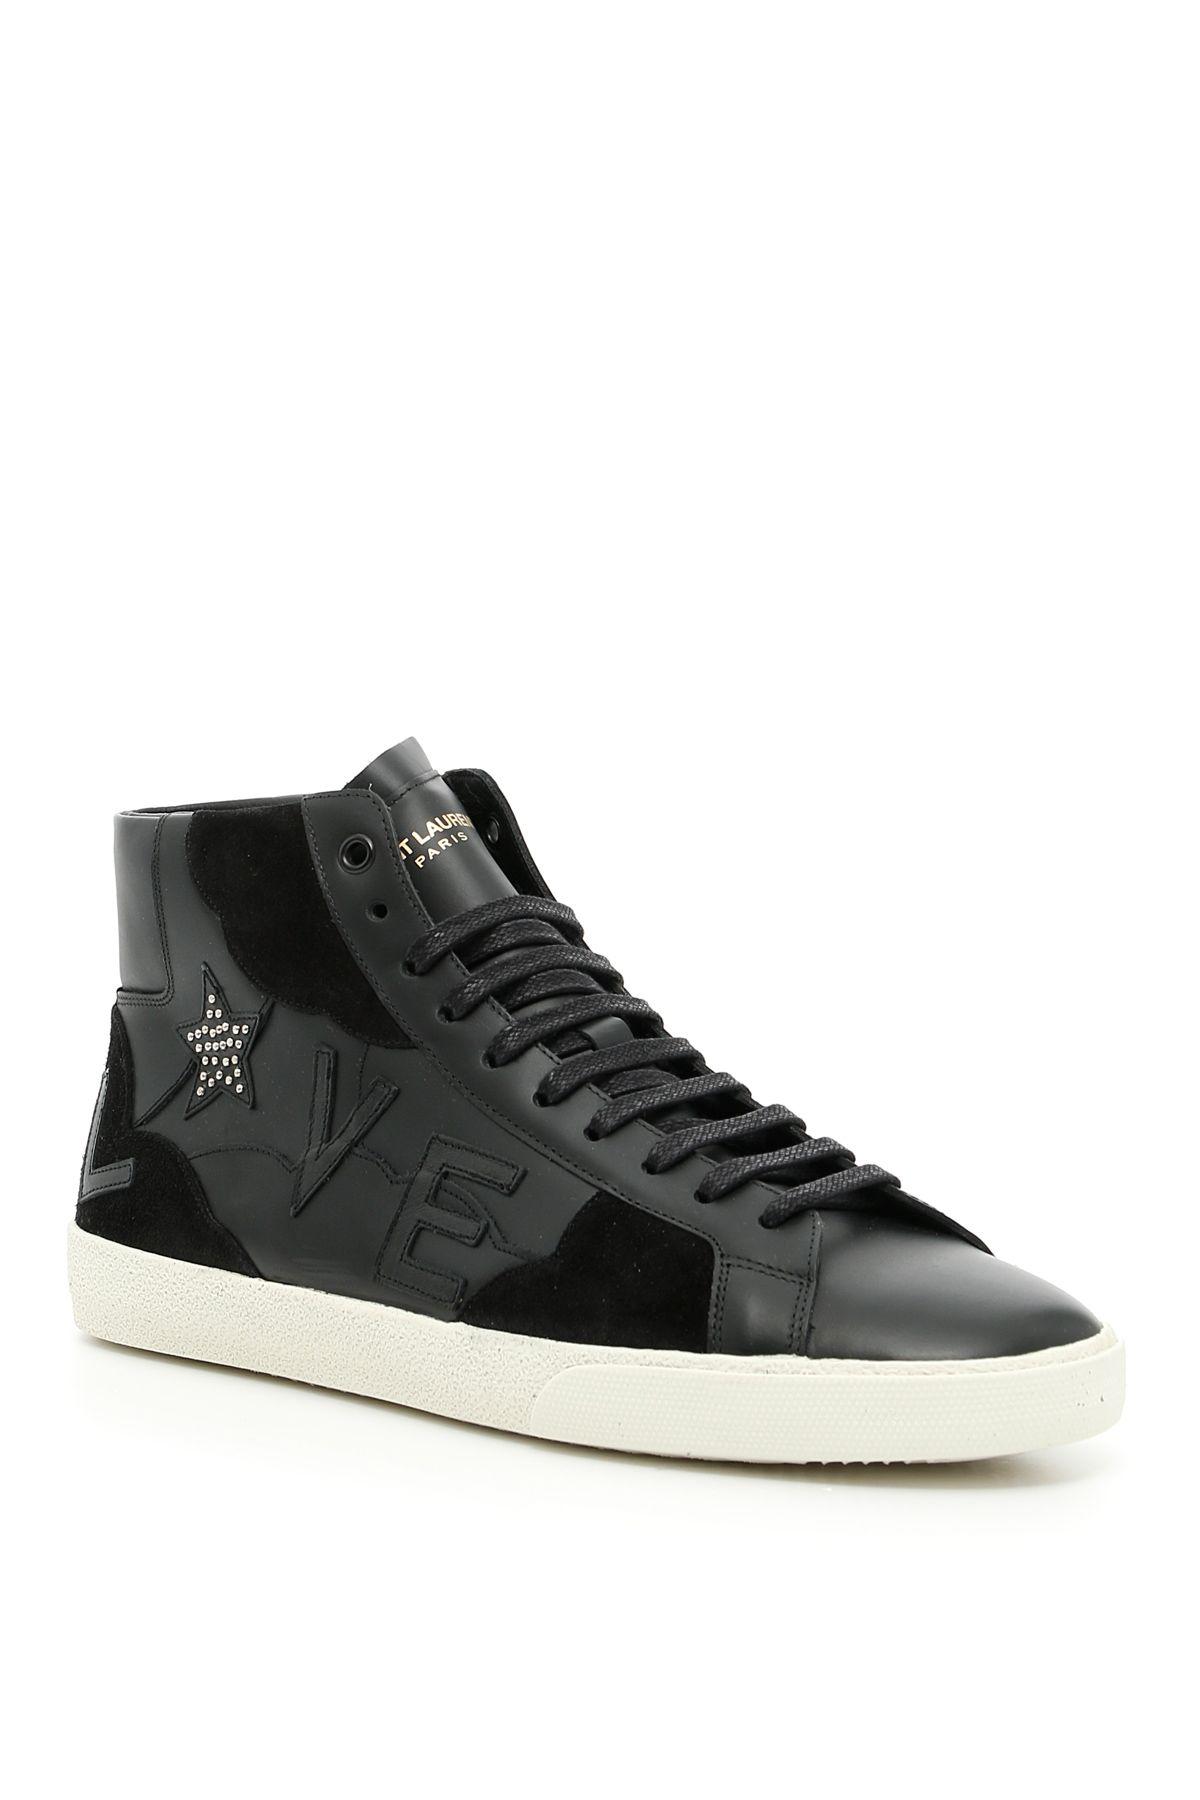 saint laurent love patch high top sneakers nero nero men 39 s sneakers italist. Black Bedroom Furniture Sets. Home Design Ideas